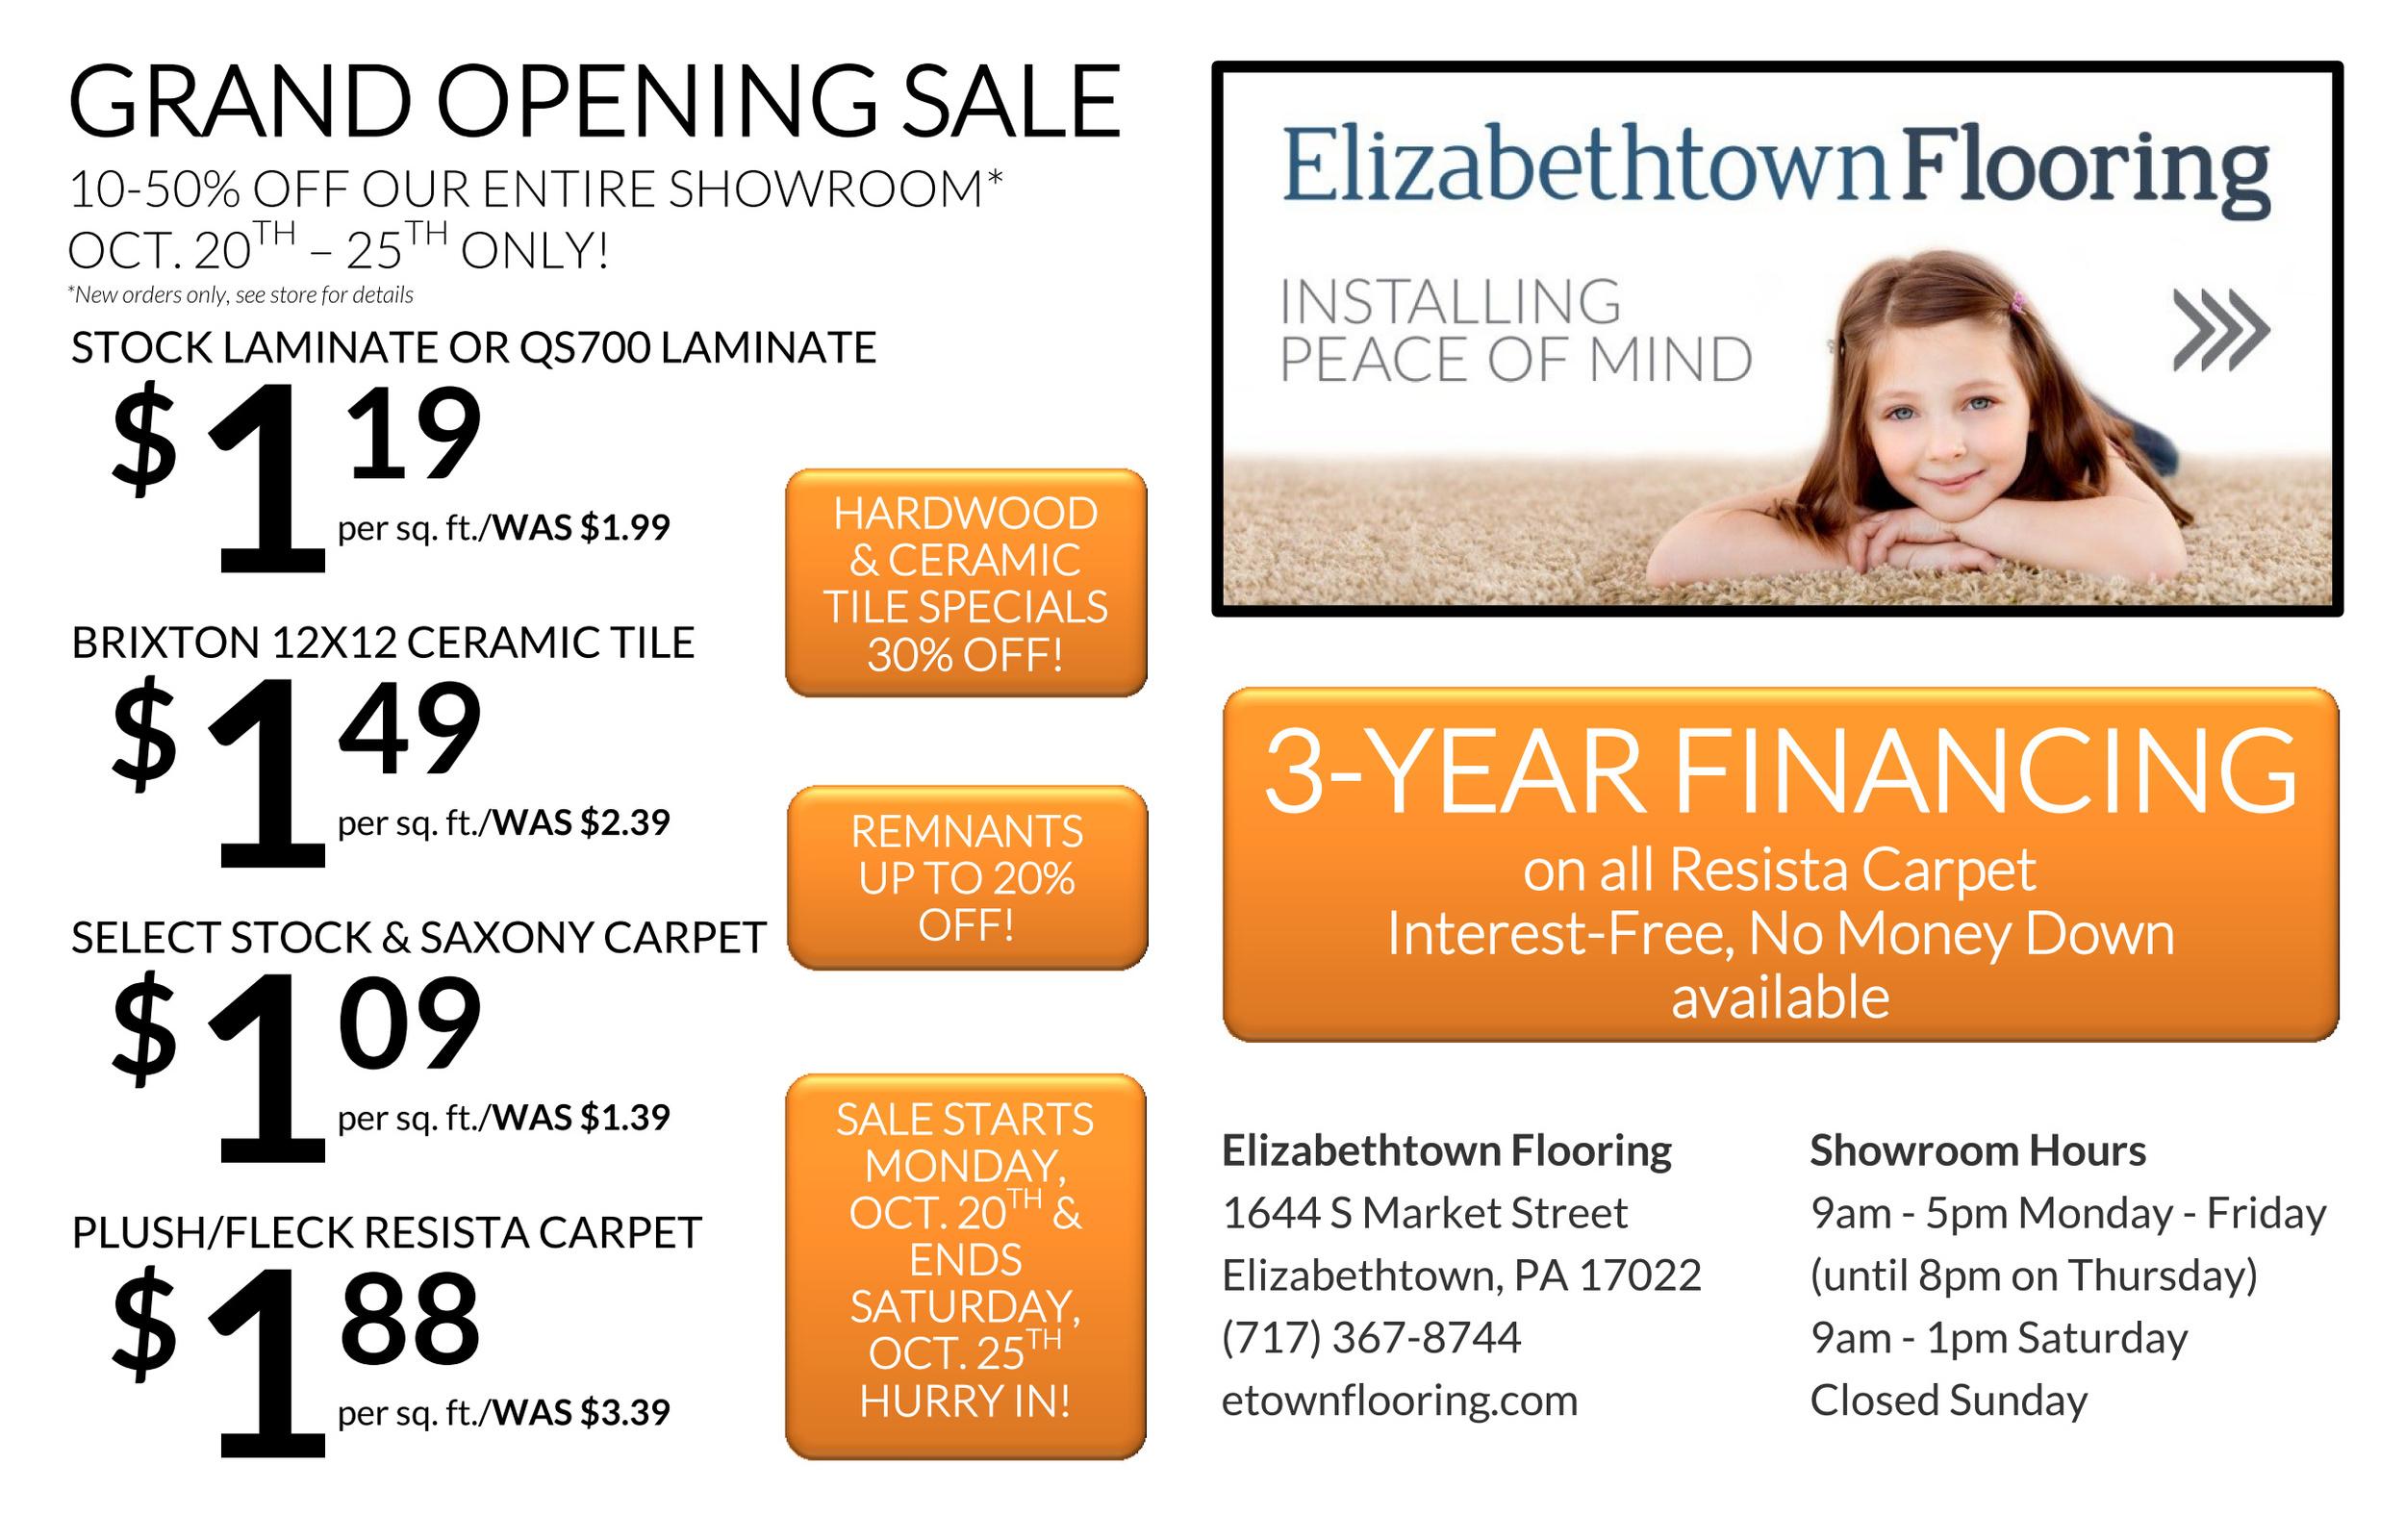 Grand Opening Sale 2014 - Elizabethtown Flooring